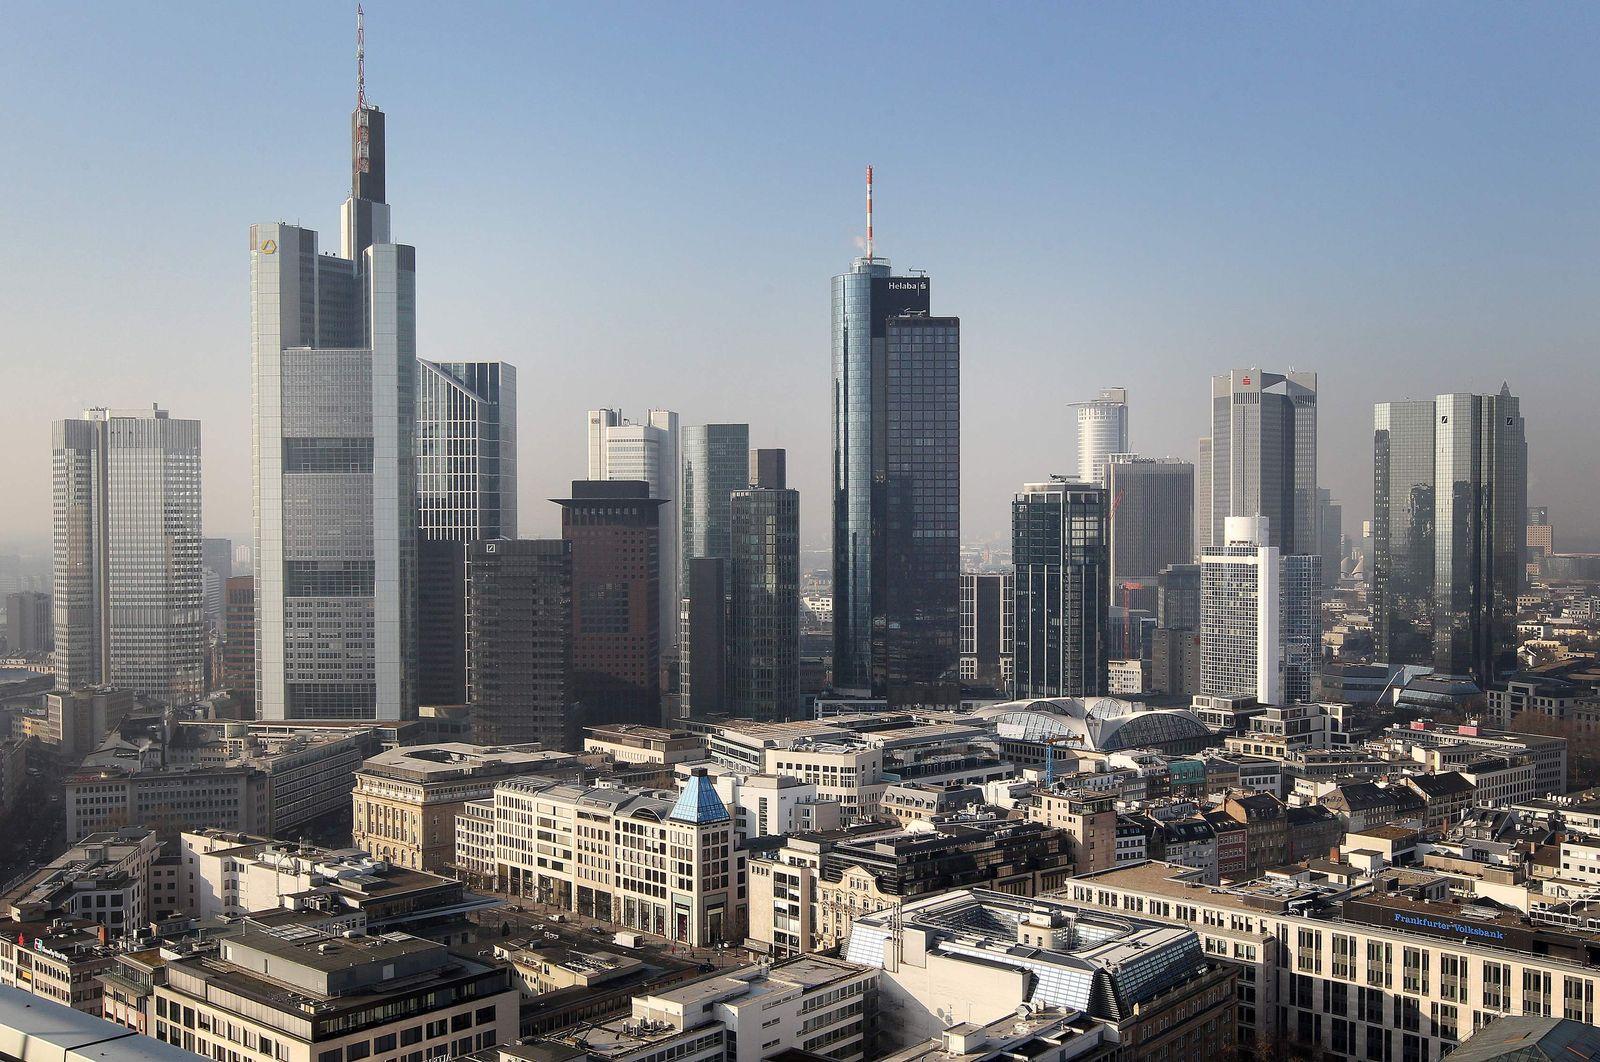 FILES-GERMANY-FRANKFURT-FINANCE-FEATURE